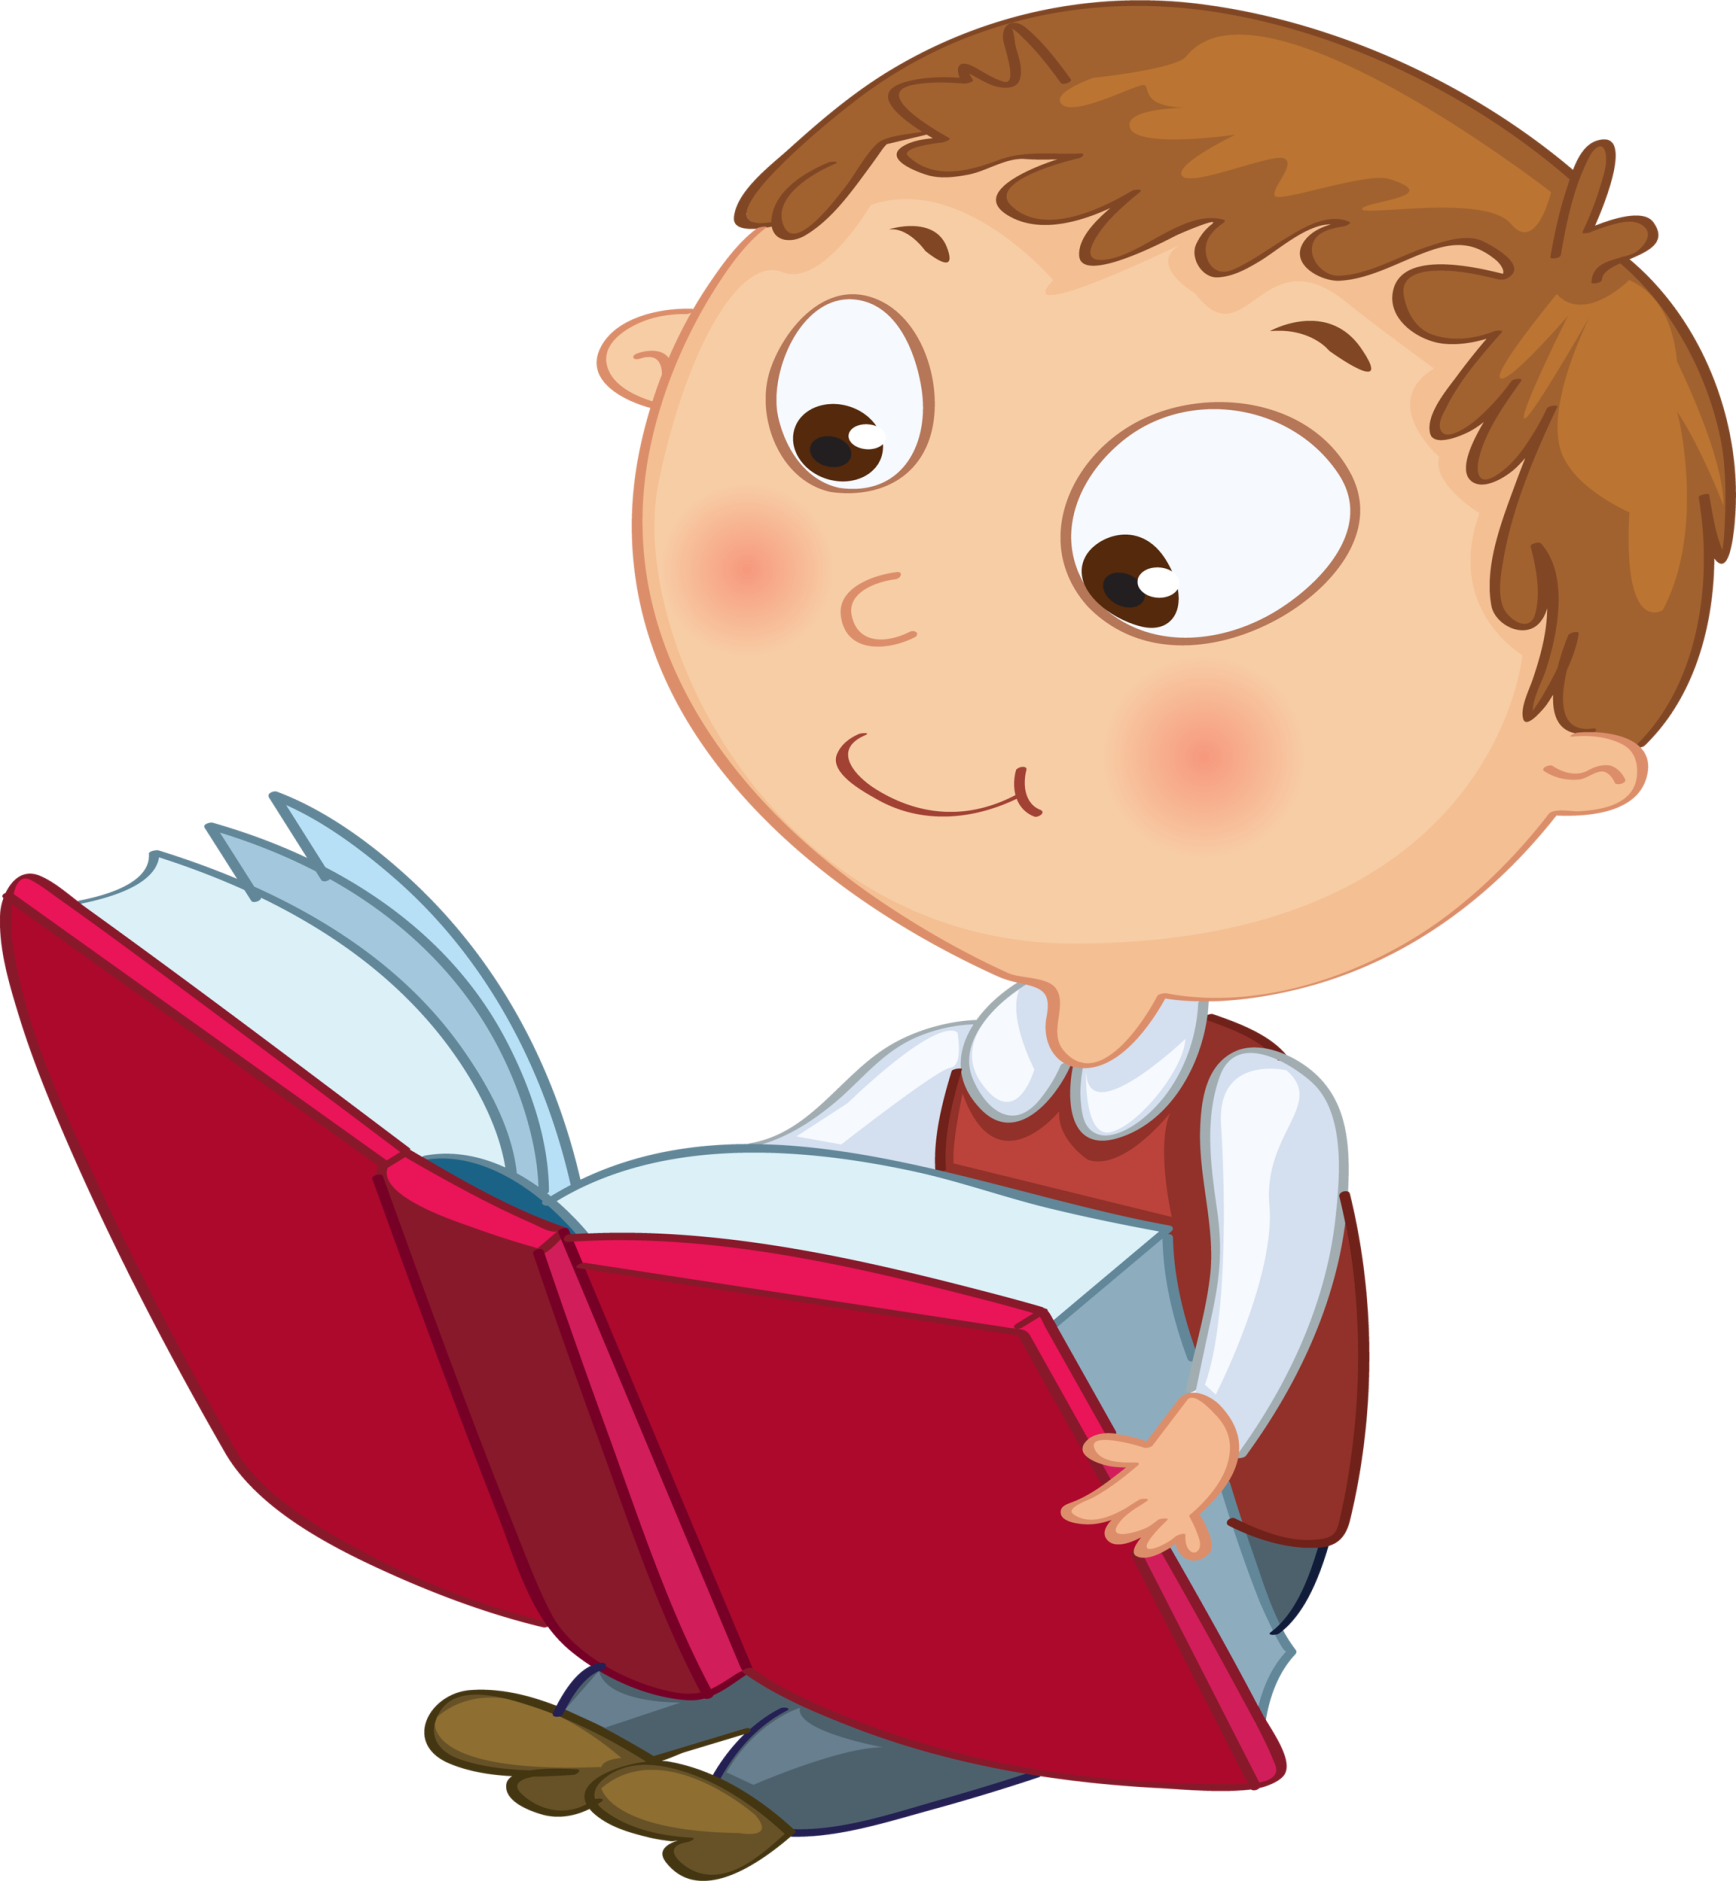 C:\Users\Наталья\Desktop\картинки\children_read_write\29.png